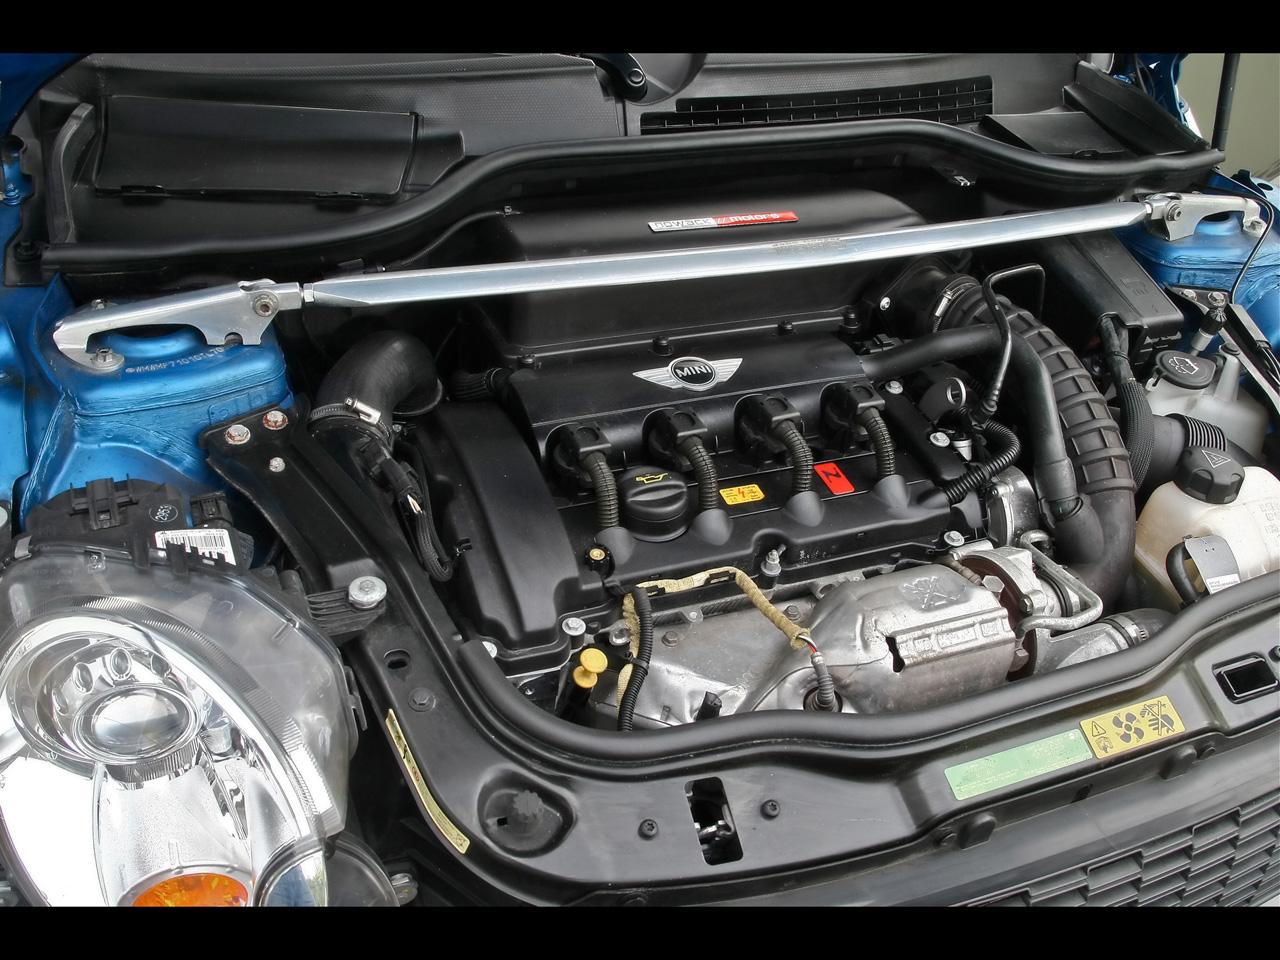 OO_7728] Mini Cooper R56 Engine Diagram Download DiagramTaliz Peted Hete Wigeg Mohammedshrine Librar Wiring 101